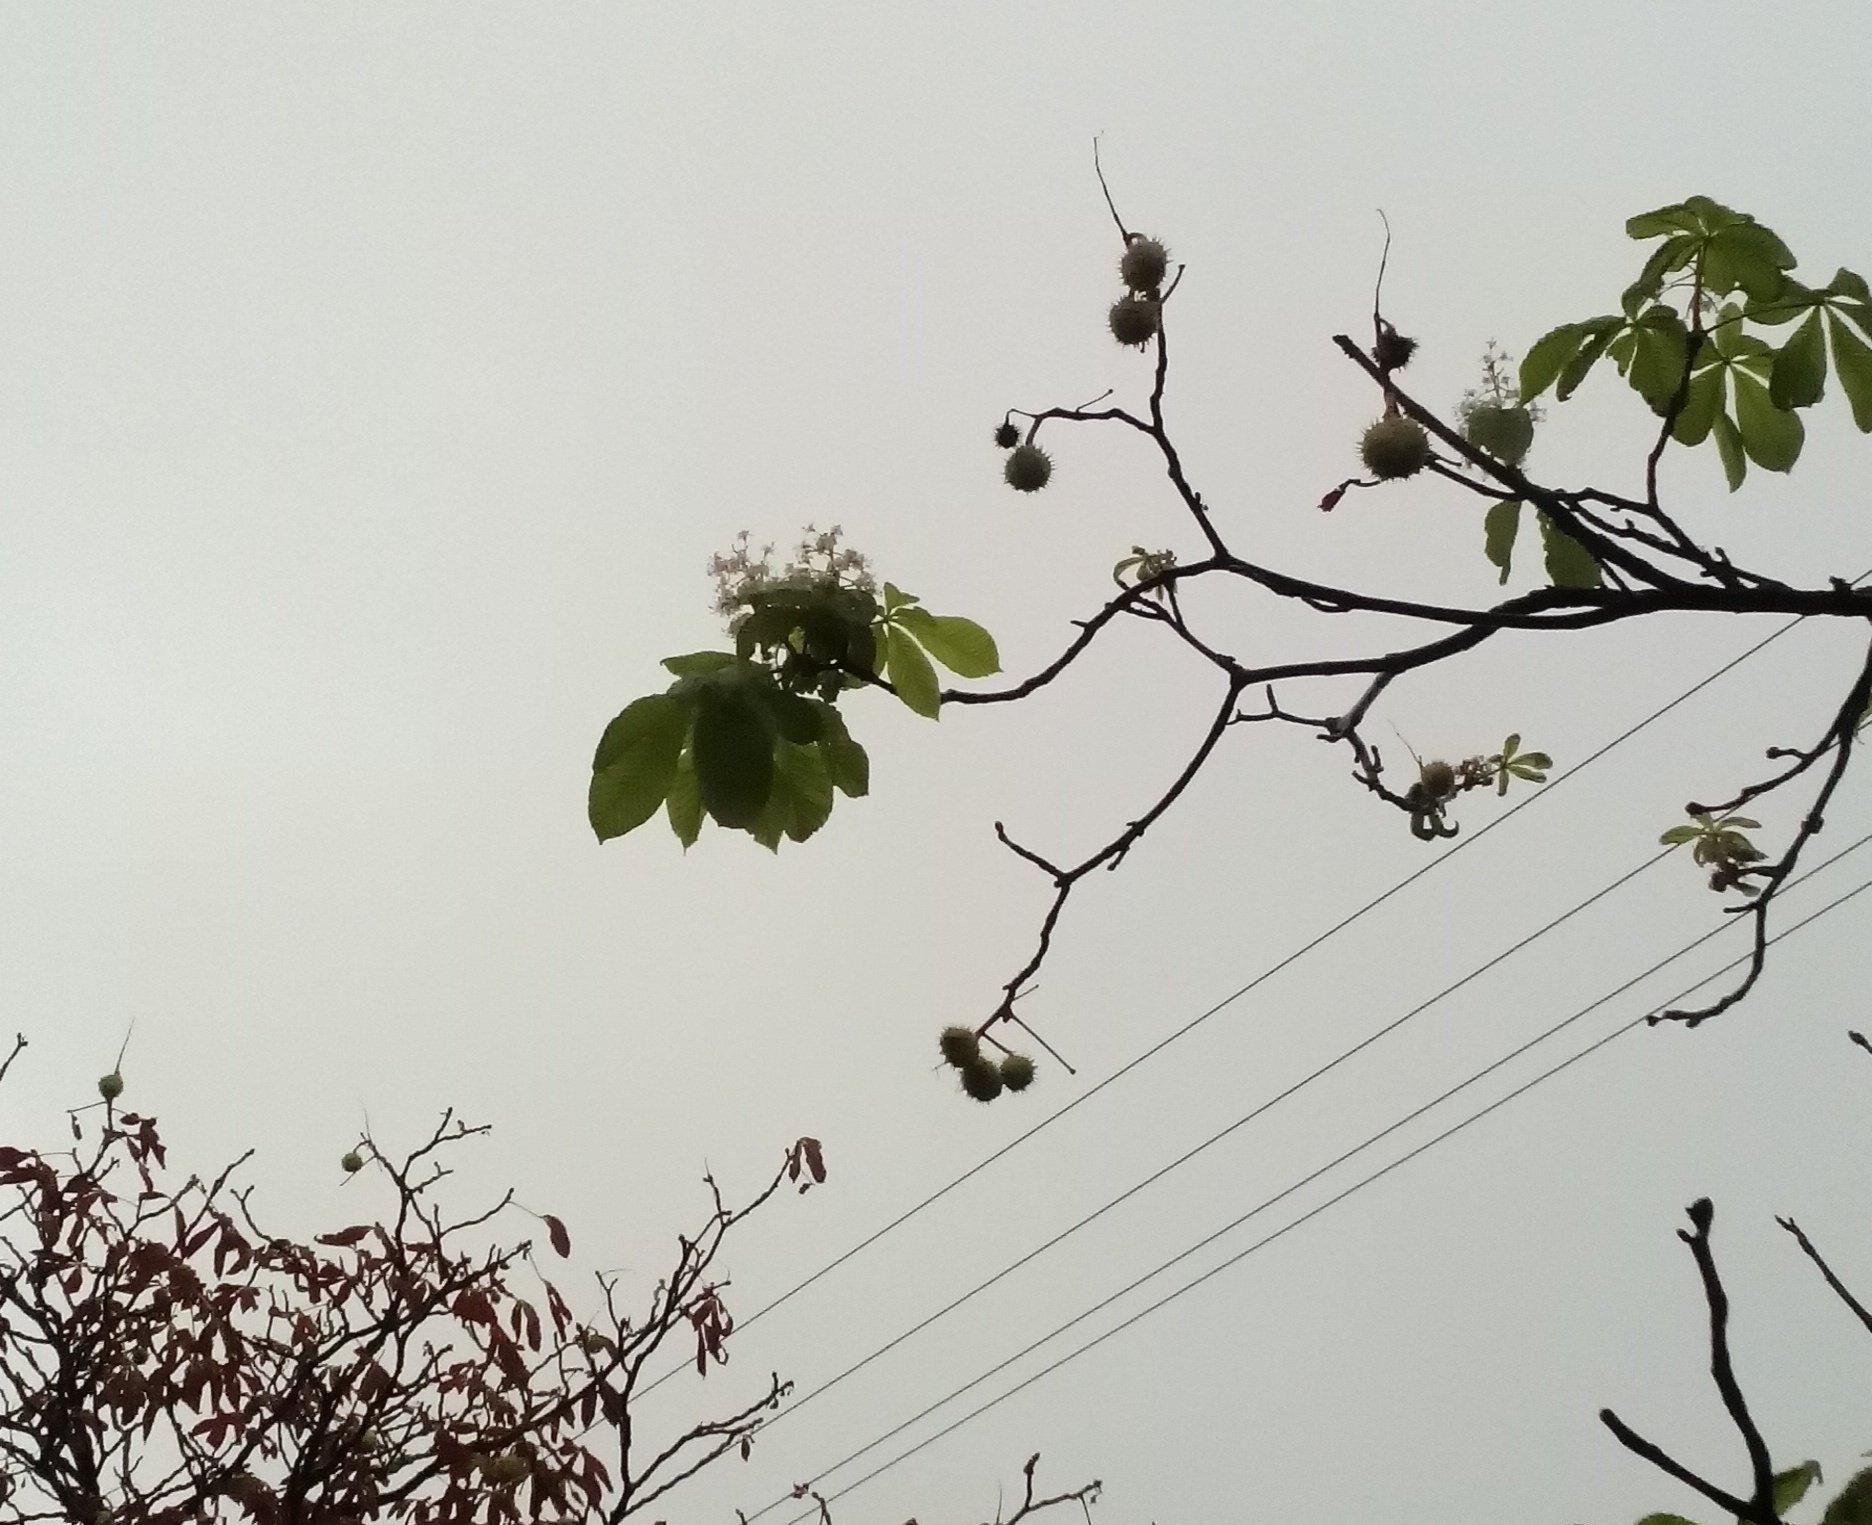 Каштаны в Минске цветут и плодоносят одновременно